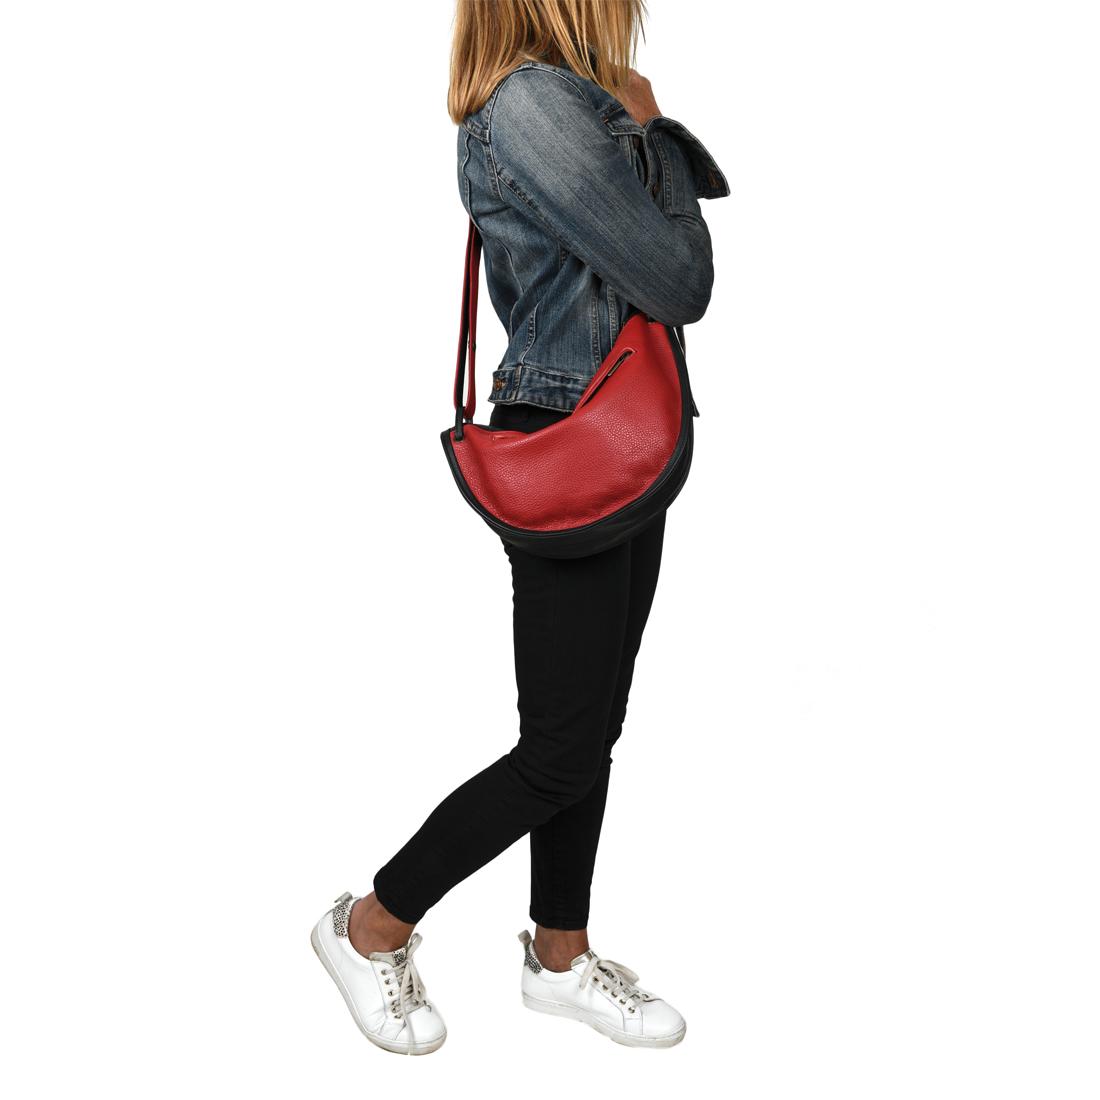 Jasmine Black Across Body Bag